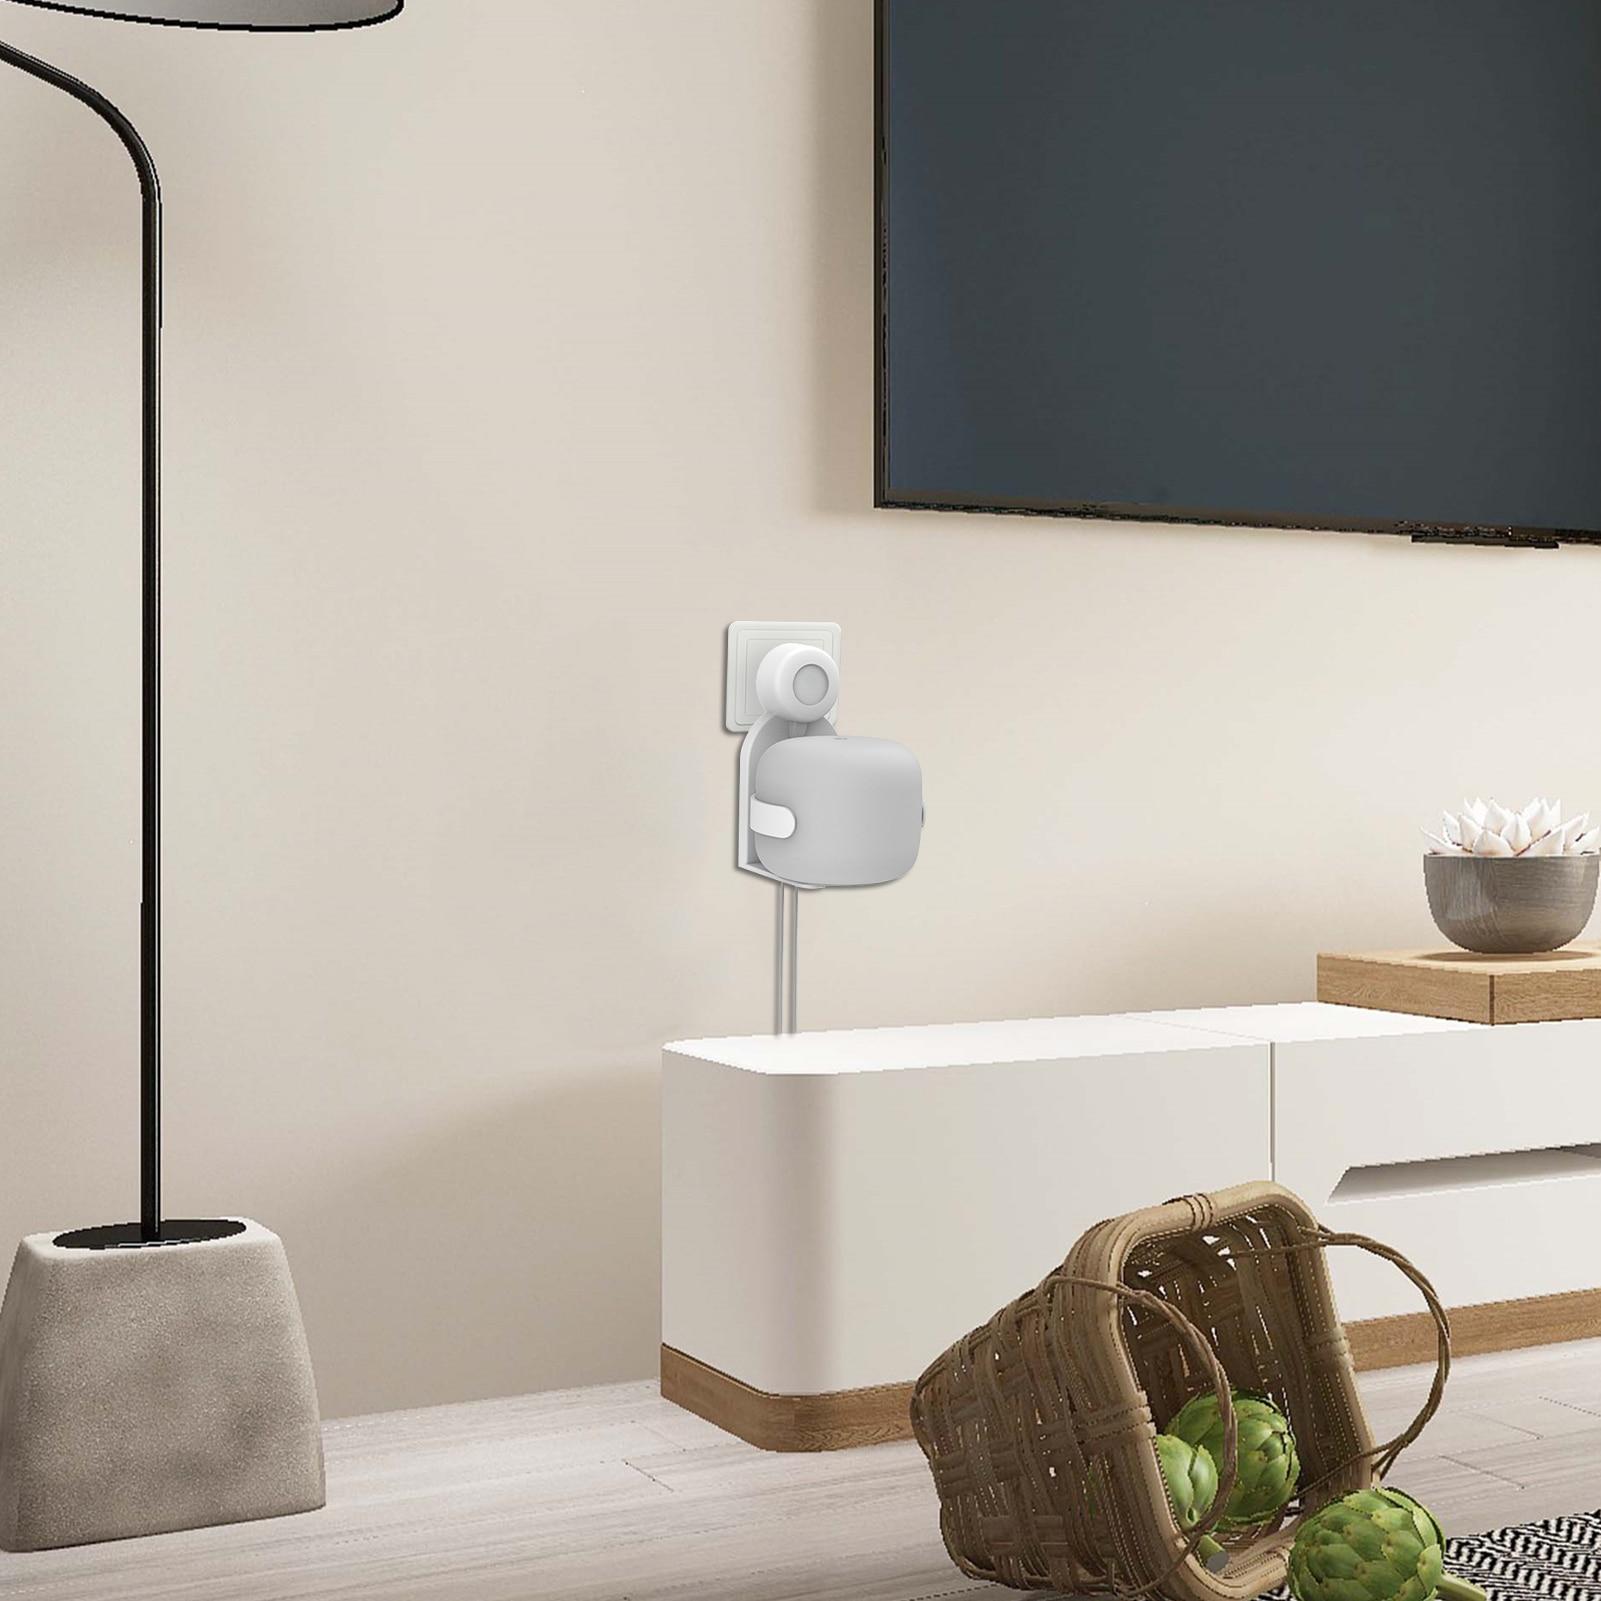 2021 New Wall Socket Bracket Router Holder for Google Nest WiFi 2nd AC2200 enlarge